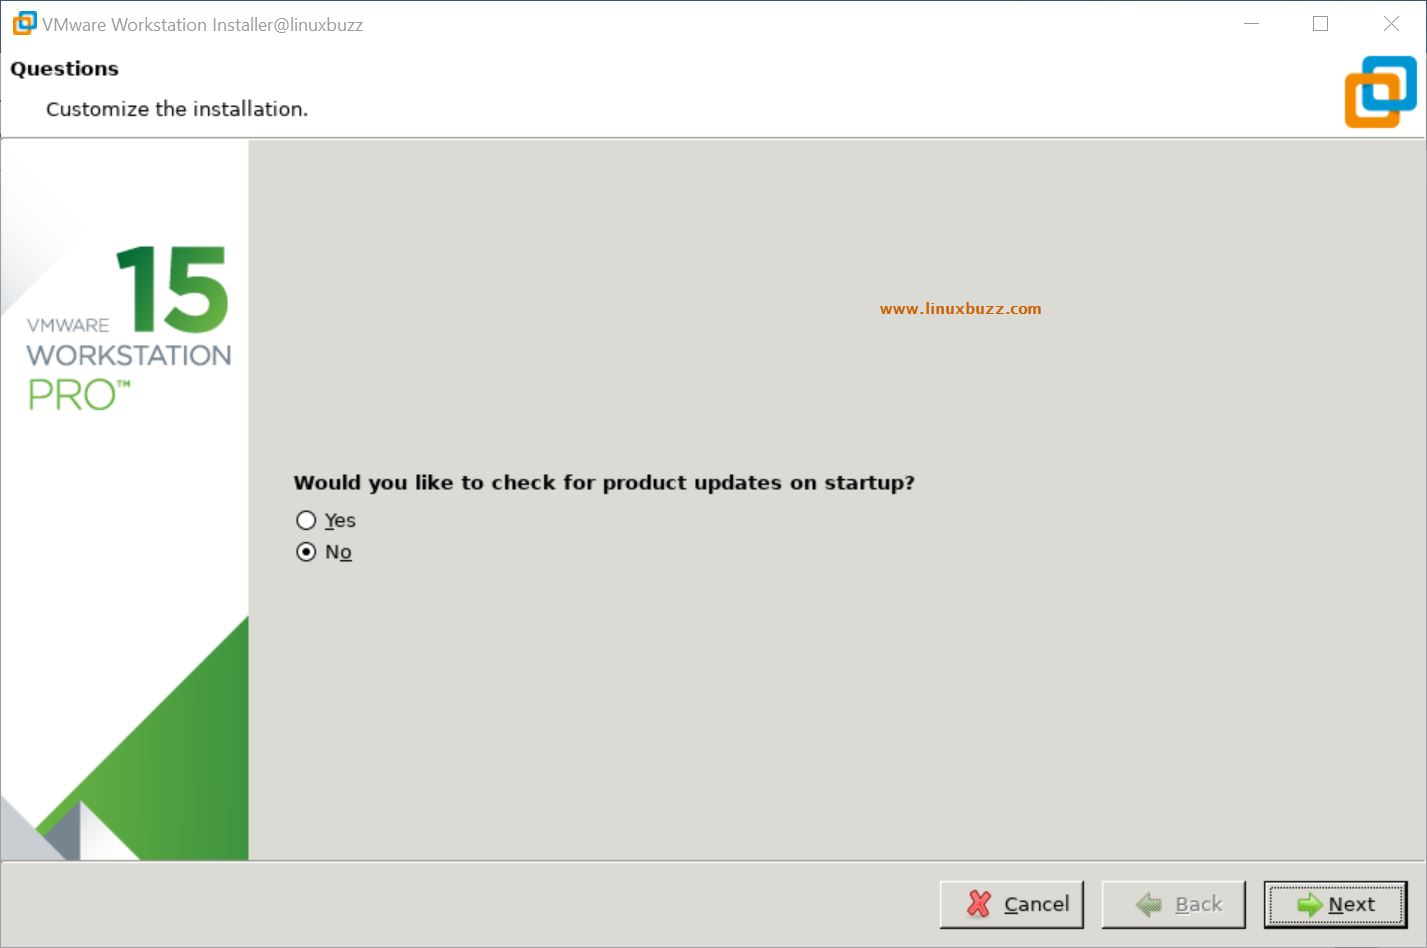 How to Install VMware Workstation on Ubuntu / Linux Mint Desktop